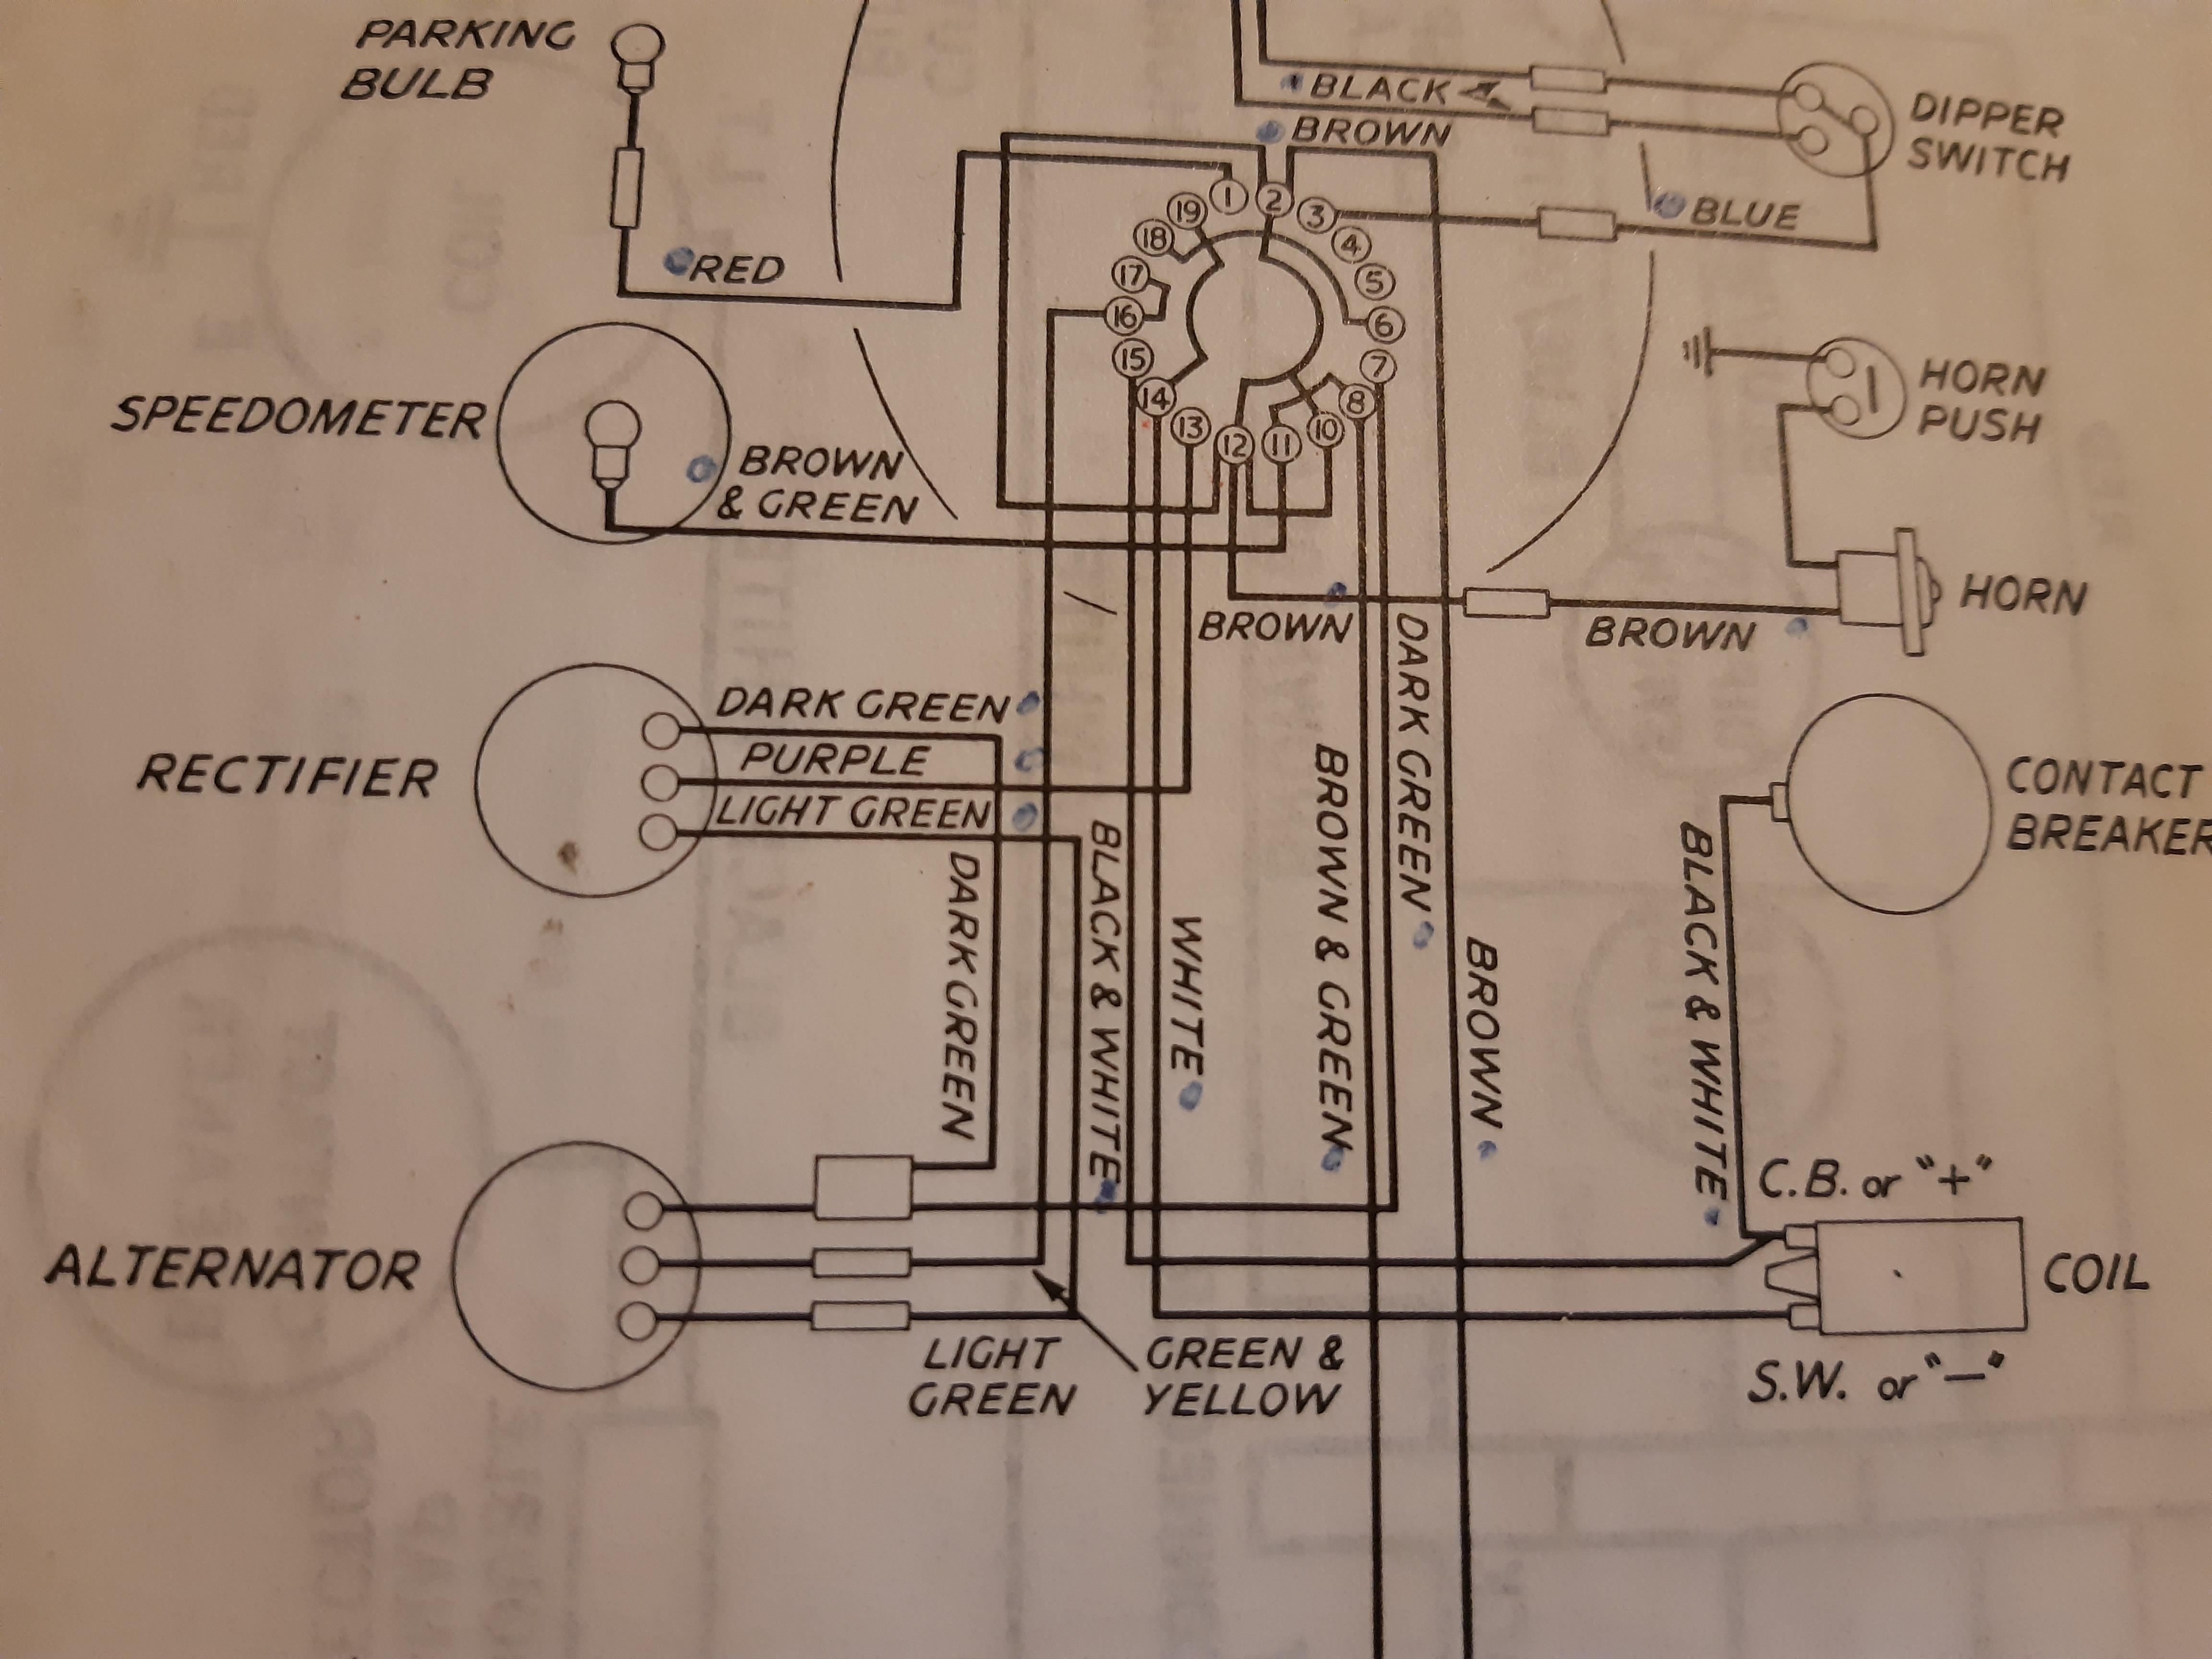 [SCHEMATICS_4NL]  Electrical Help For A Bag Of Nerves | The Triumph Forum | Triumph America Wiring Diagram |  | The Triumph Forum